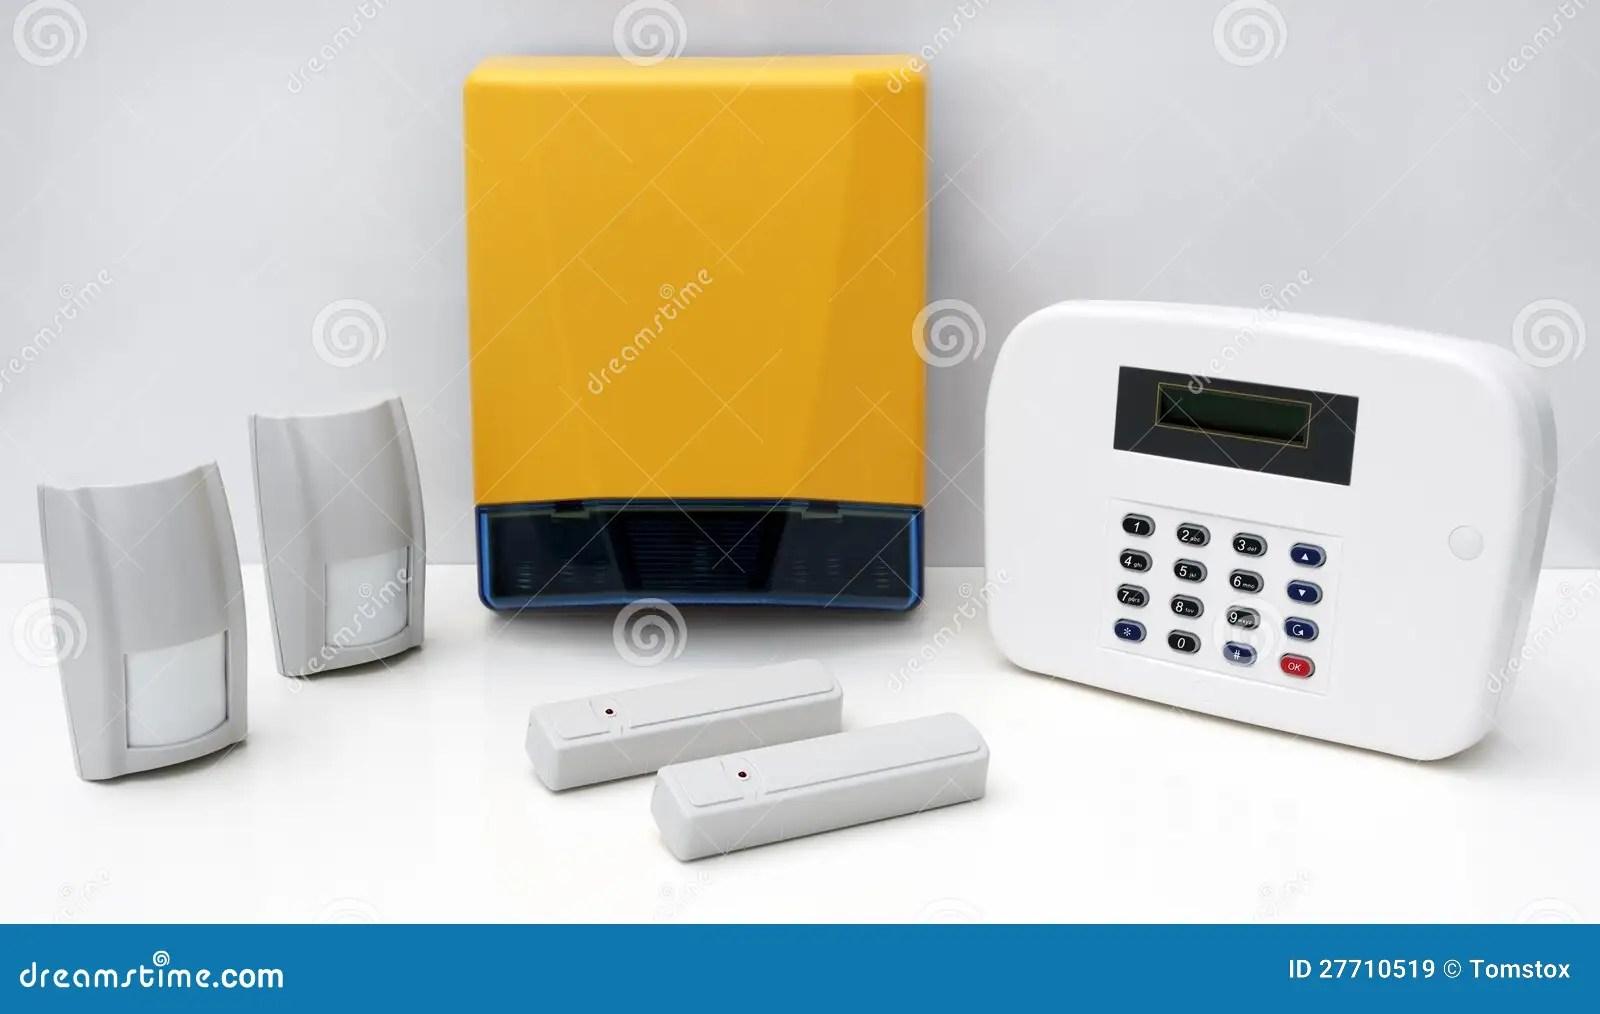 Domestic Burglar Alarm Systems